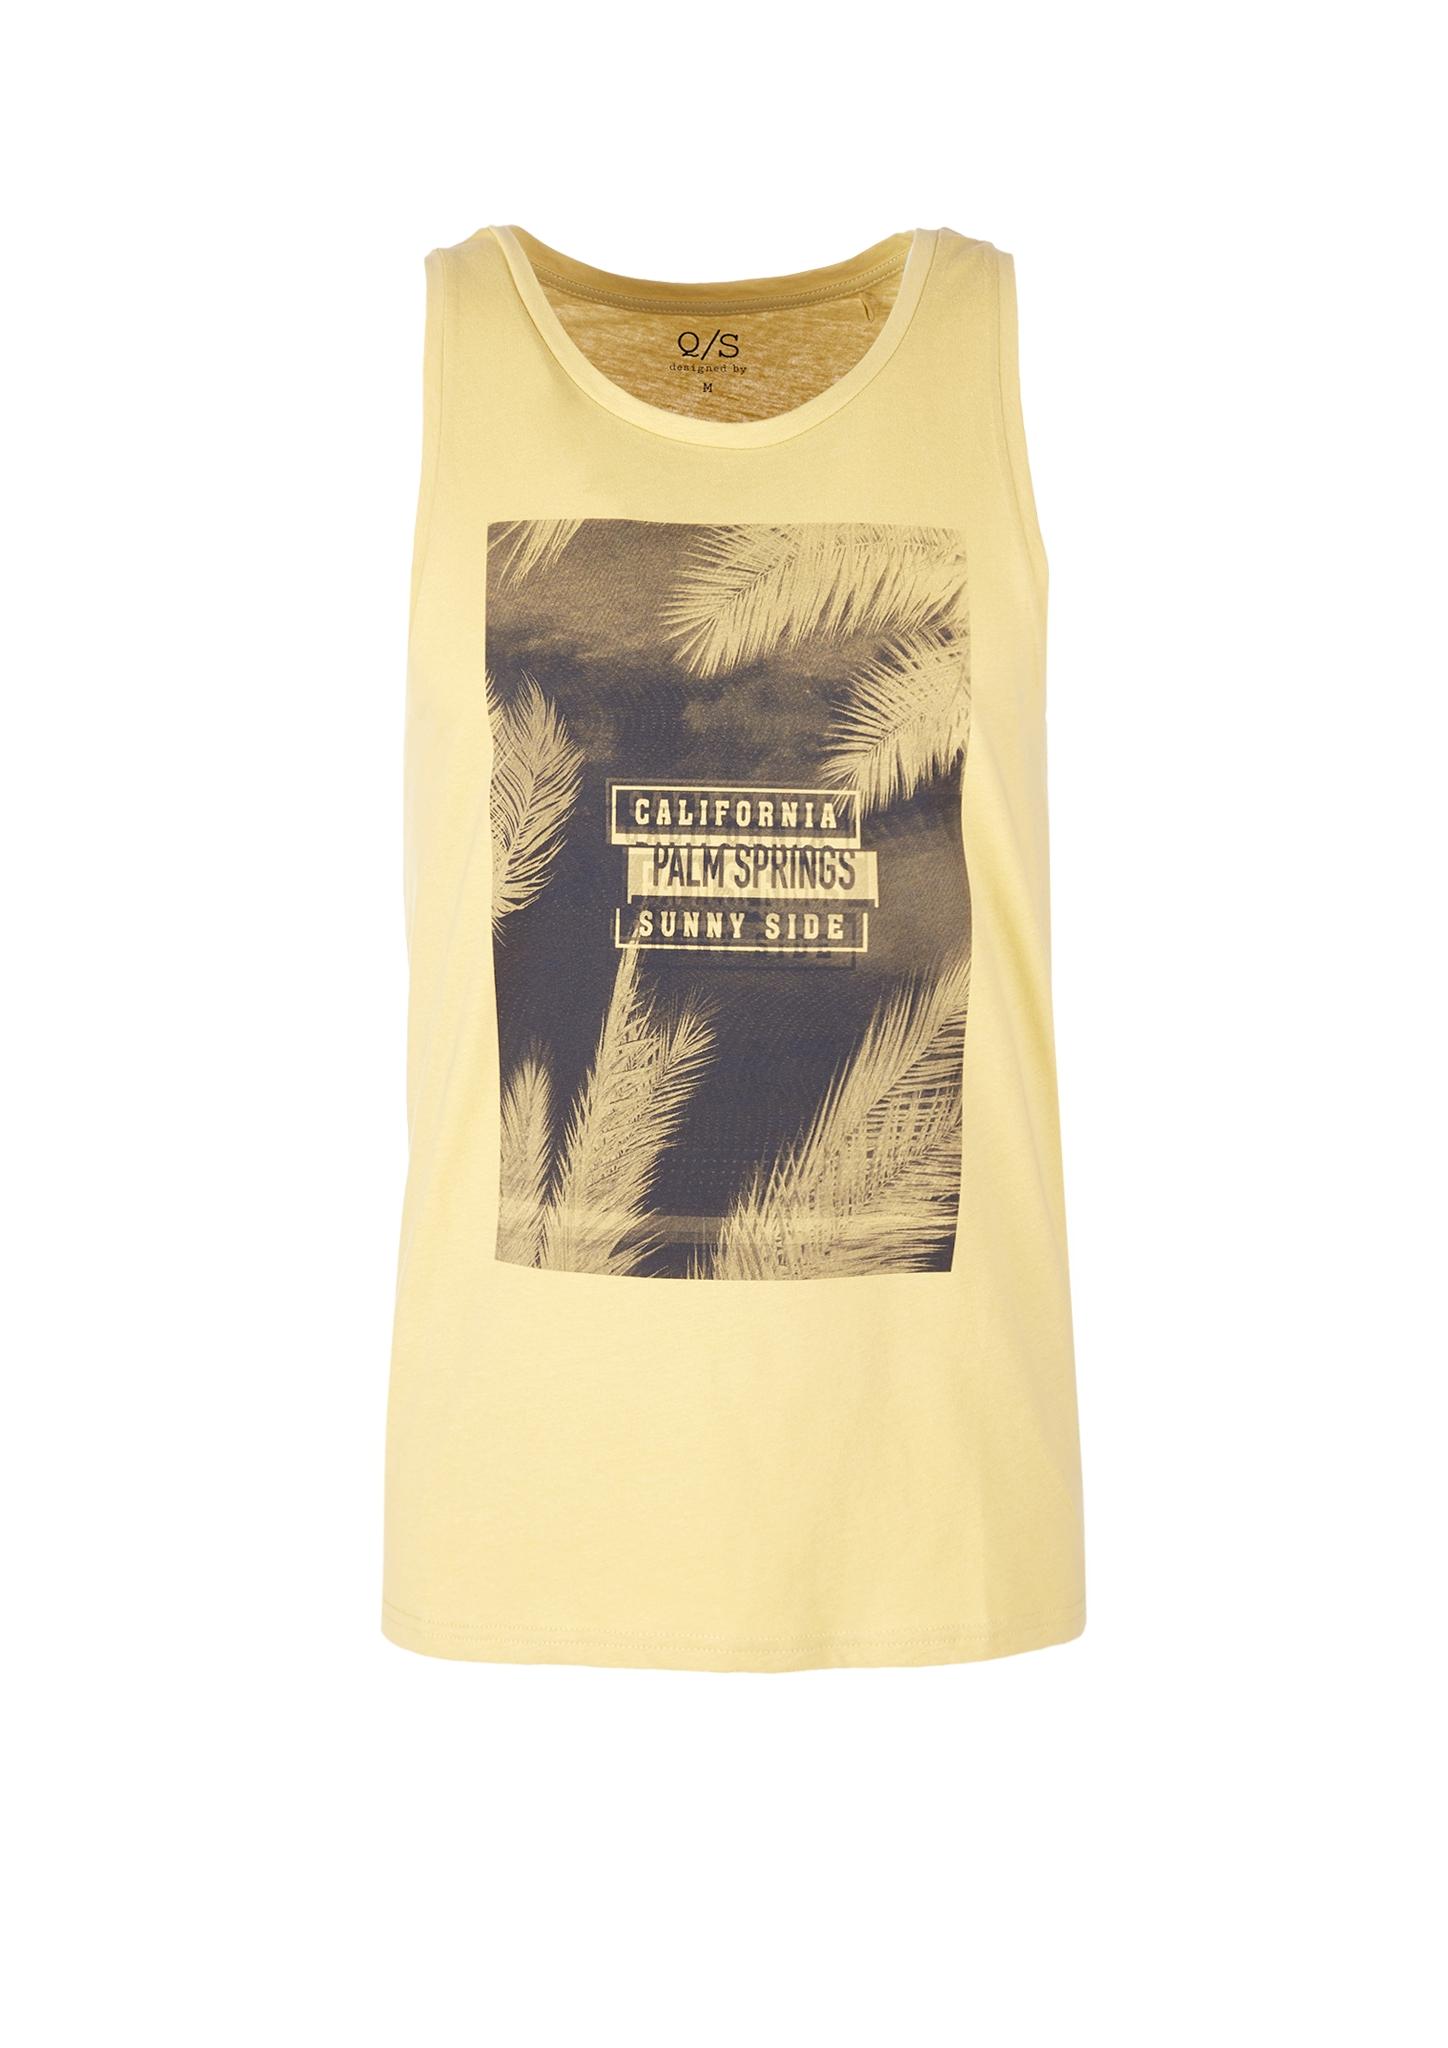 T-Shirt ärmellos   Bekleidung > Shirts > T-Shirts   Gelb   100% baumwolle   Q/S designed by